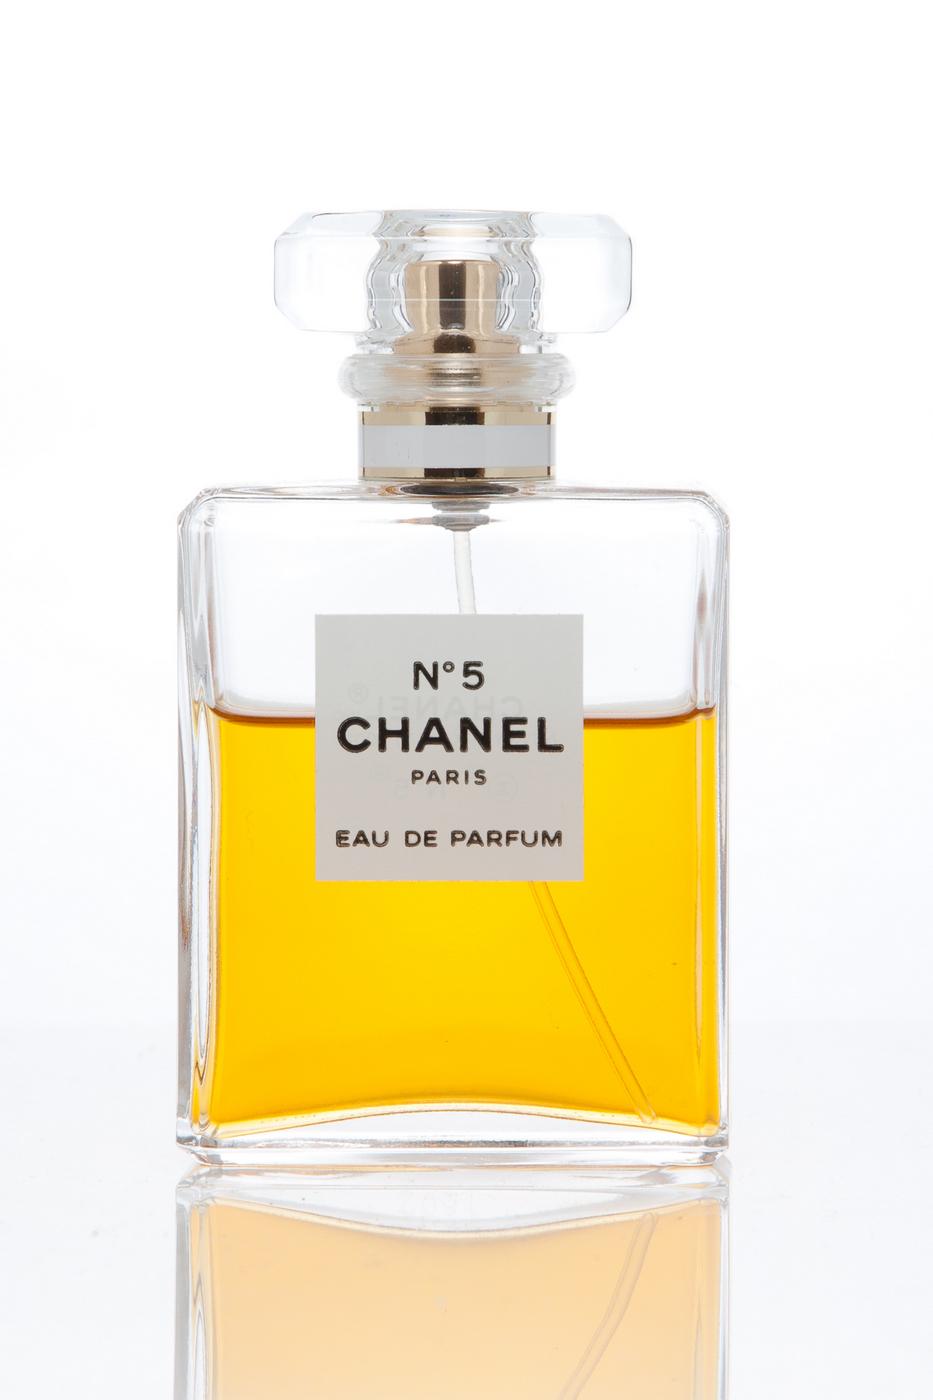 No 5 - Chanel